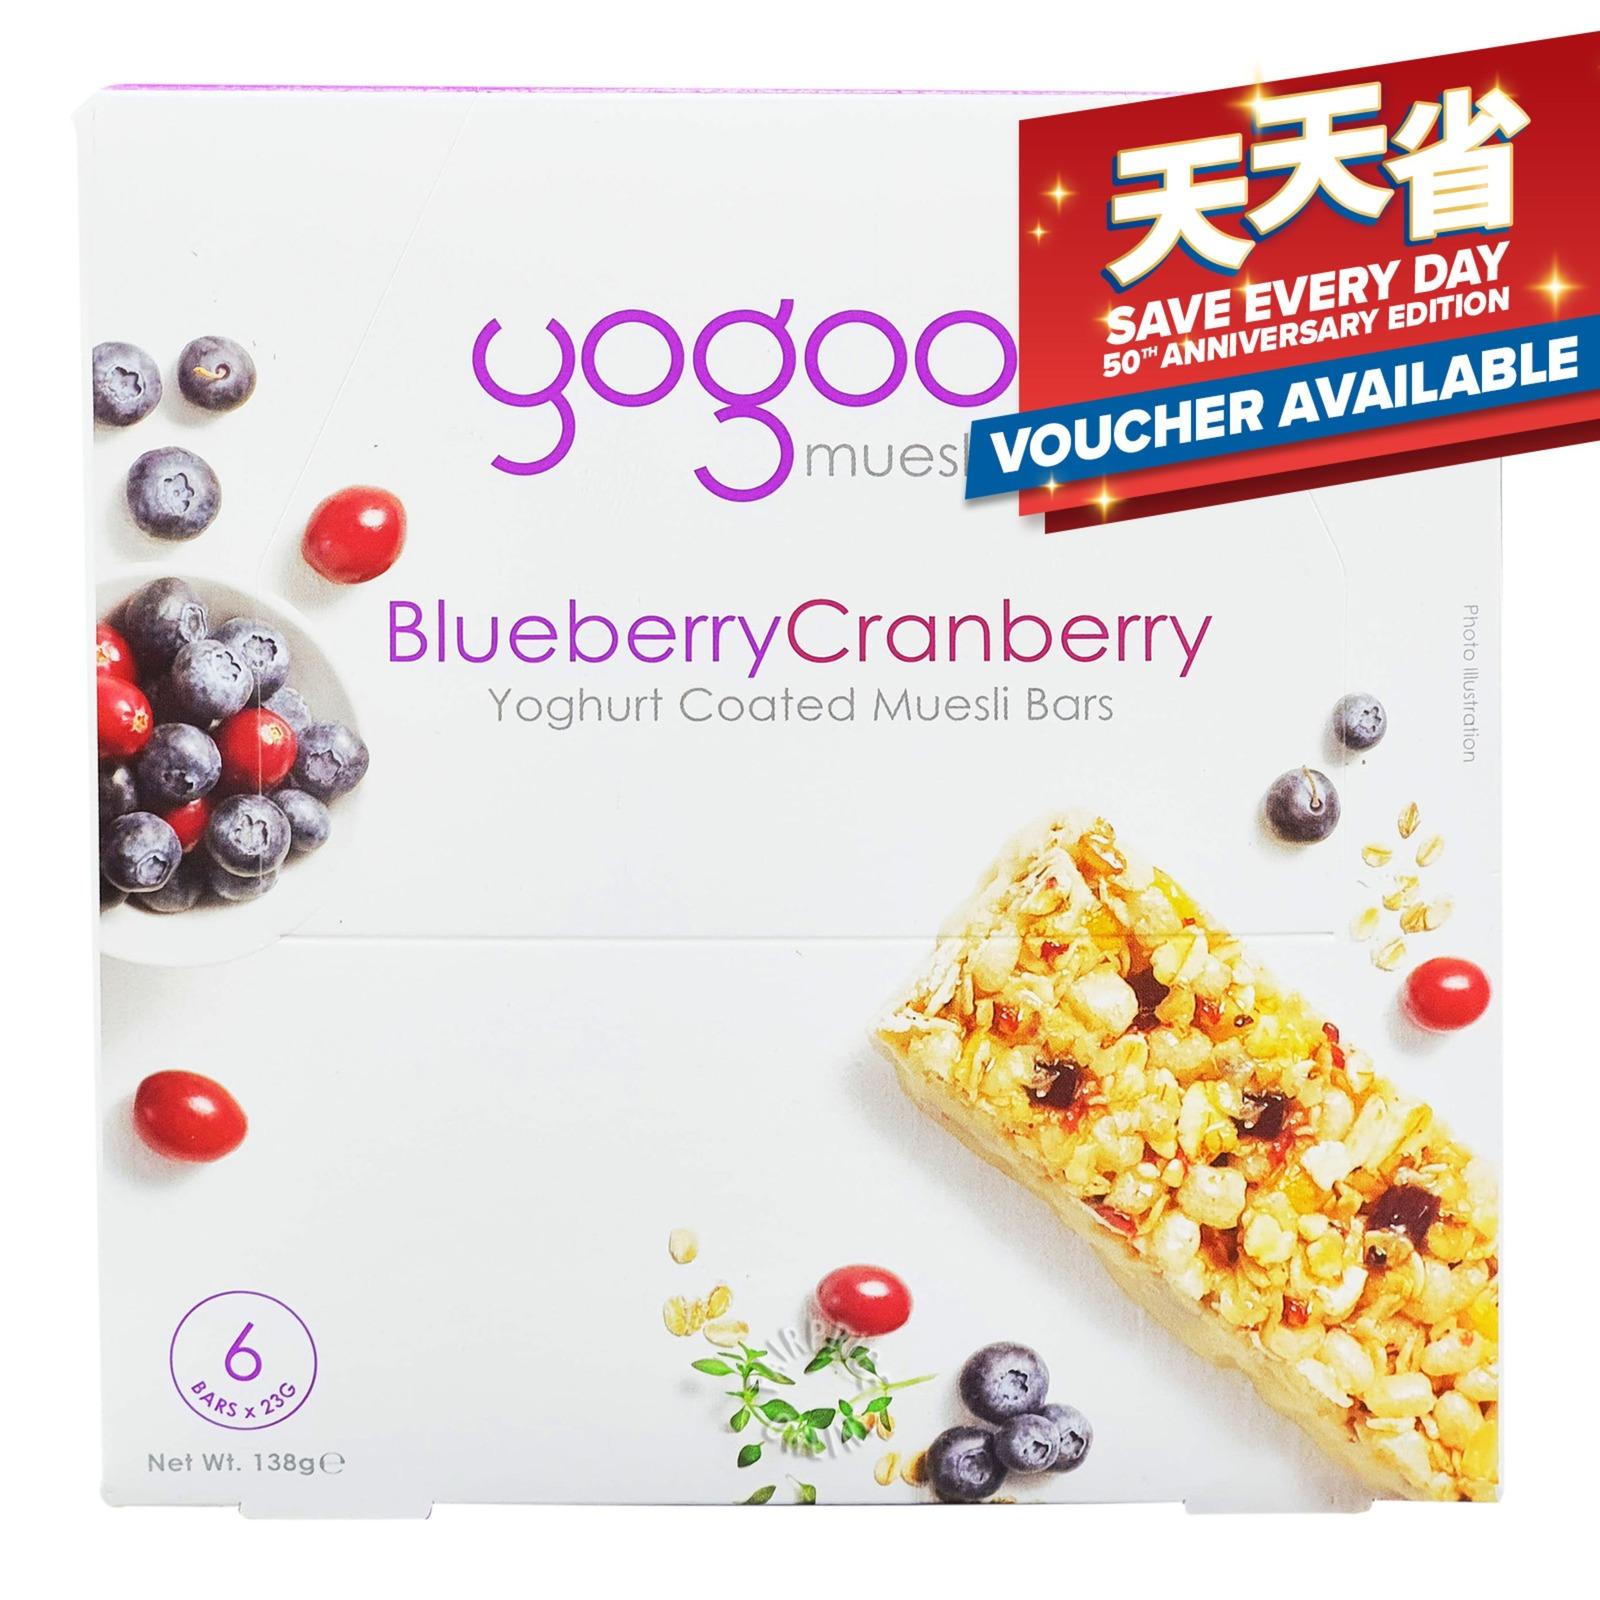 Yogood Yoghurt Coated Muesli Bars - Blueberry & Cranberry